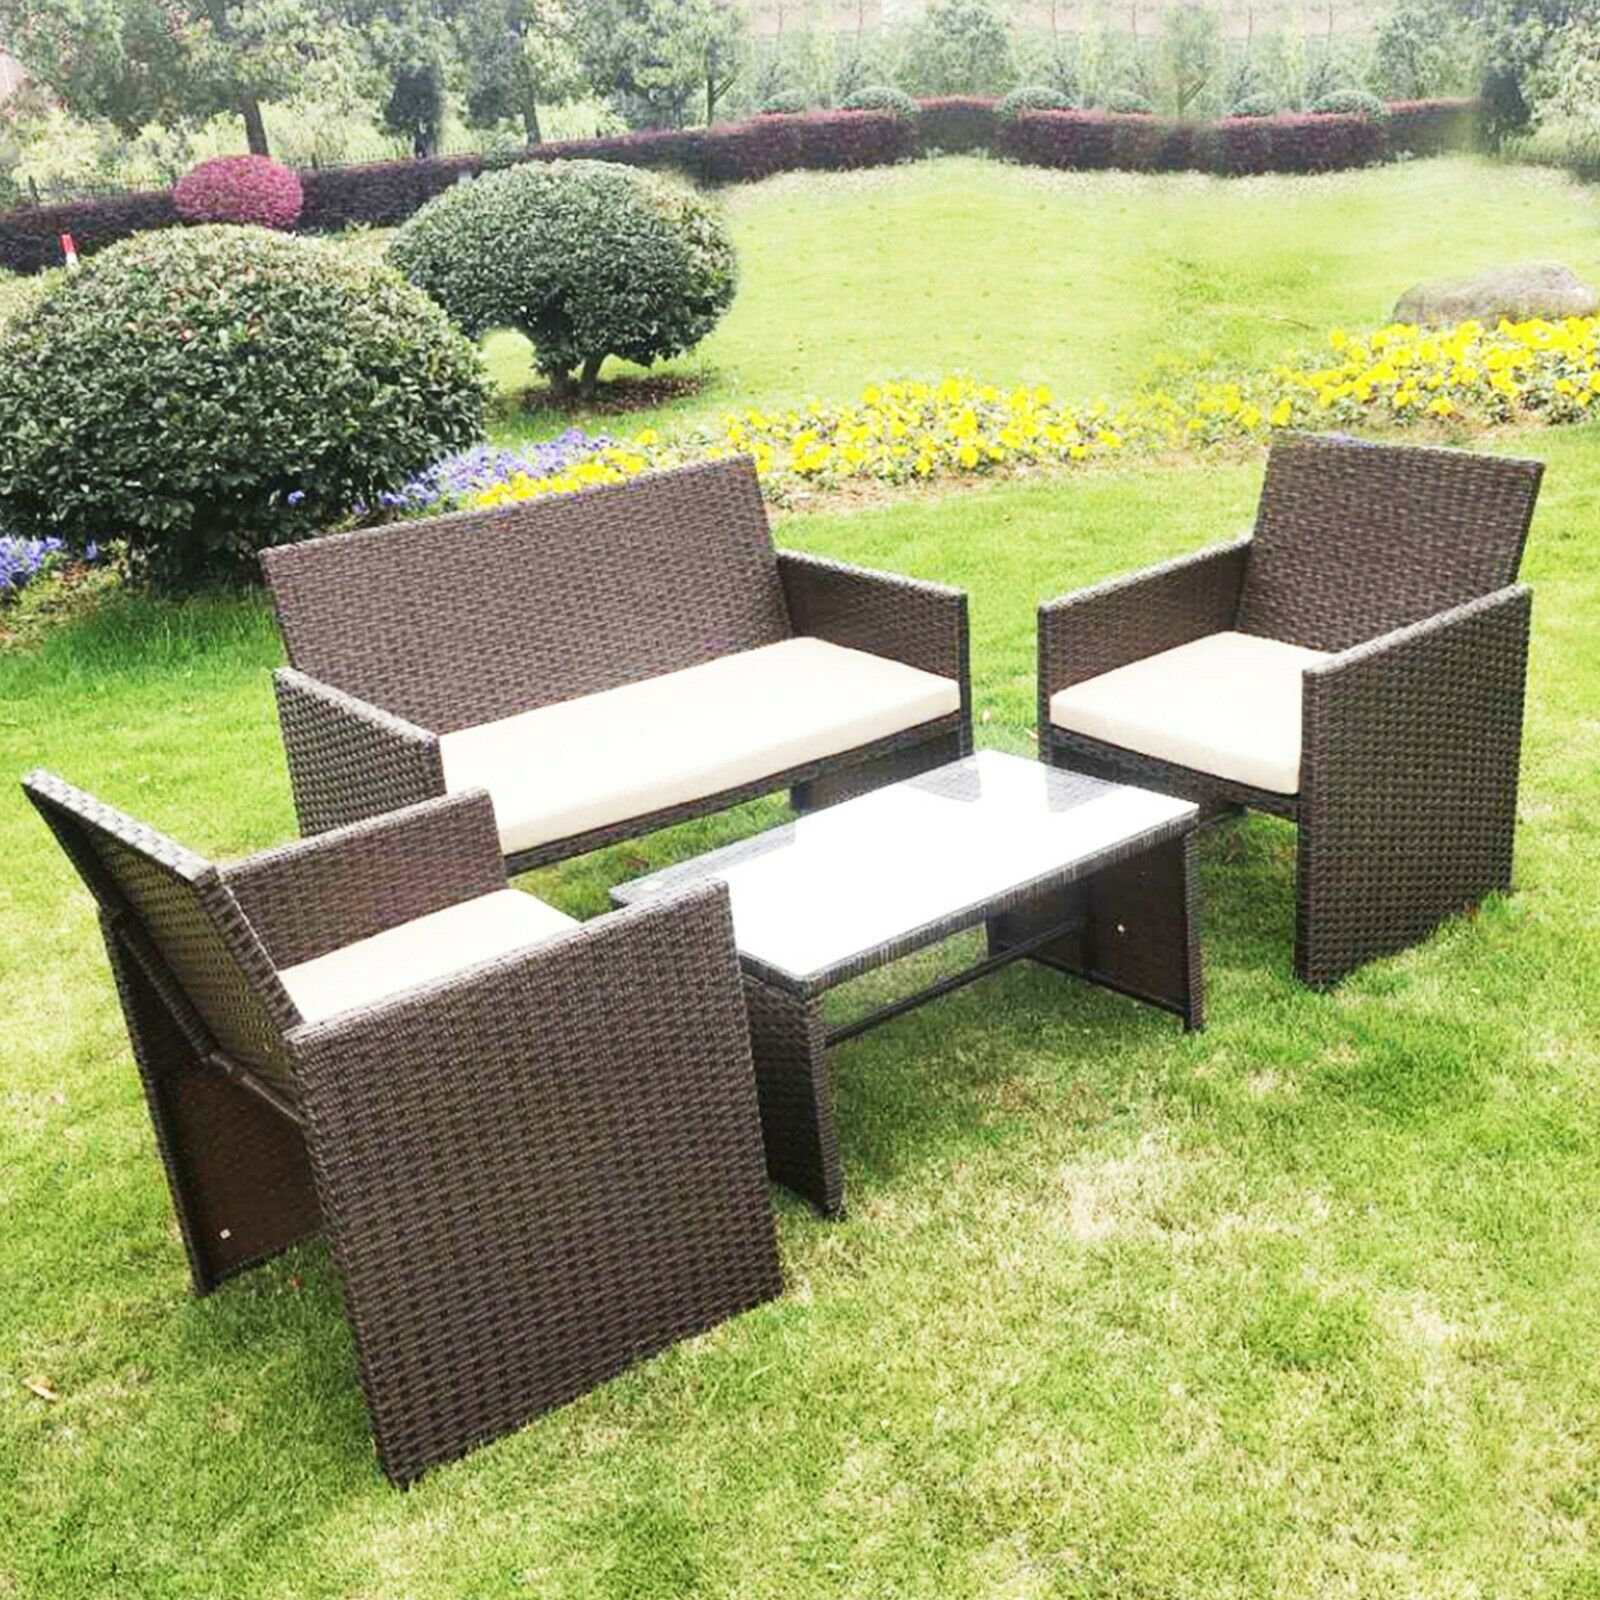 Garden Furniture - 4PC Rattan Set Outdoor Garden Patio Furniture - 1x Love Seat, 2x Chairs & Table